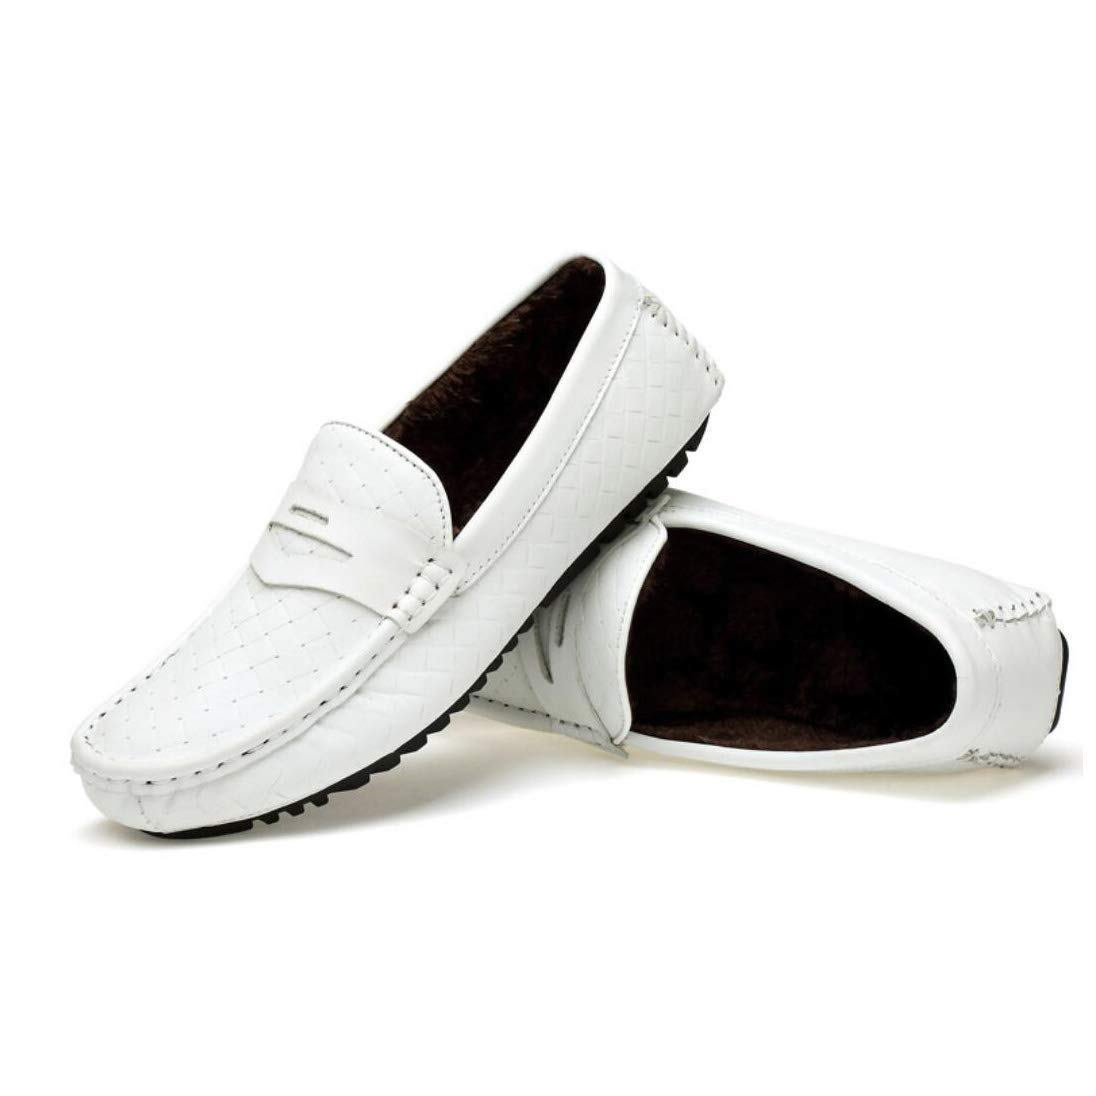 Herren Leder Frühling Komfort Komfort Komfort Loafers & Slip-Ons, Hohlen Atmungsaktive Peas Schuhe, Koreanische Mode Herren Casual Fahr Schuhe (Farbe   D, Größe   45)  23707f